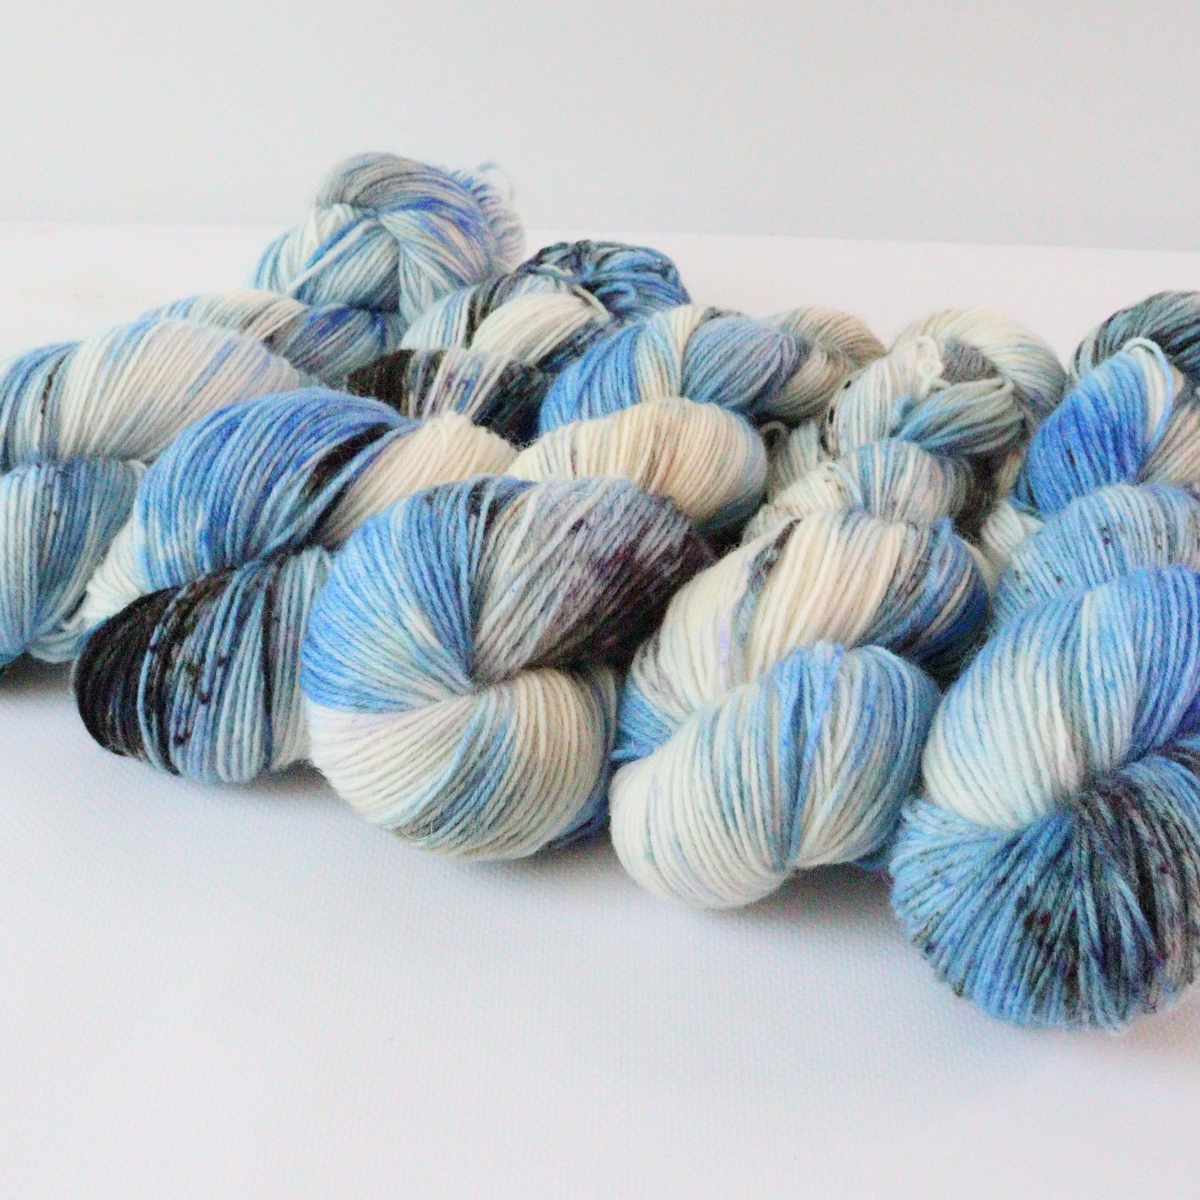 woodico.pro hand dyed yarn 081 5 1200x1200 - Hand dyed yarn / 081